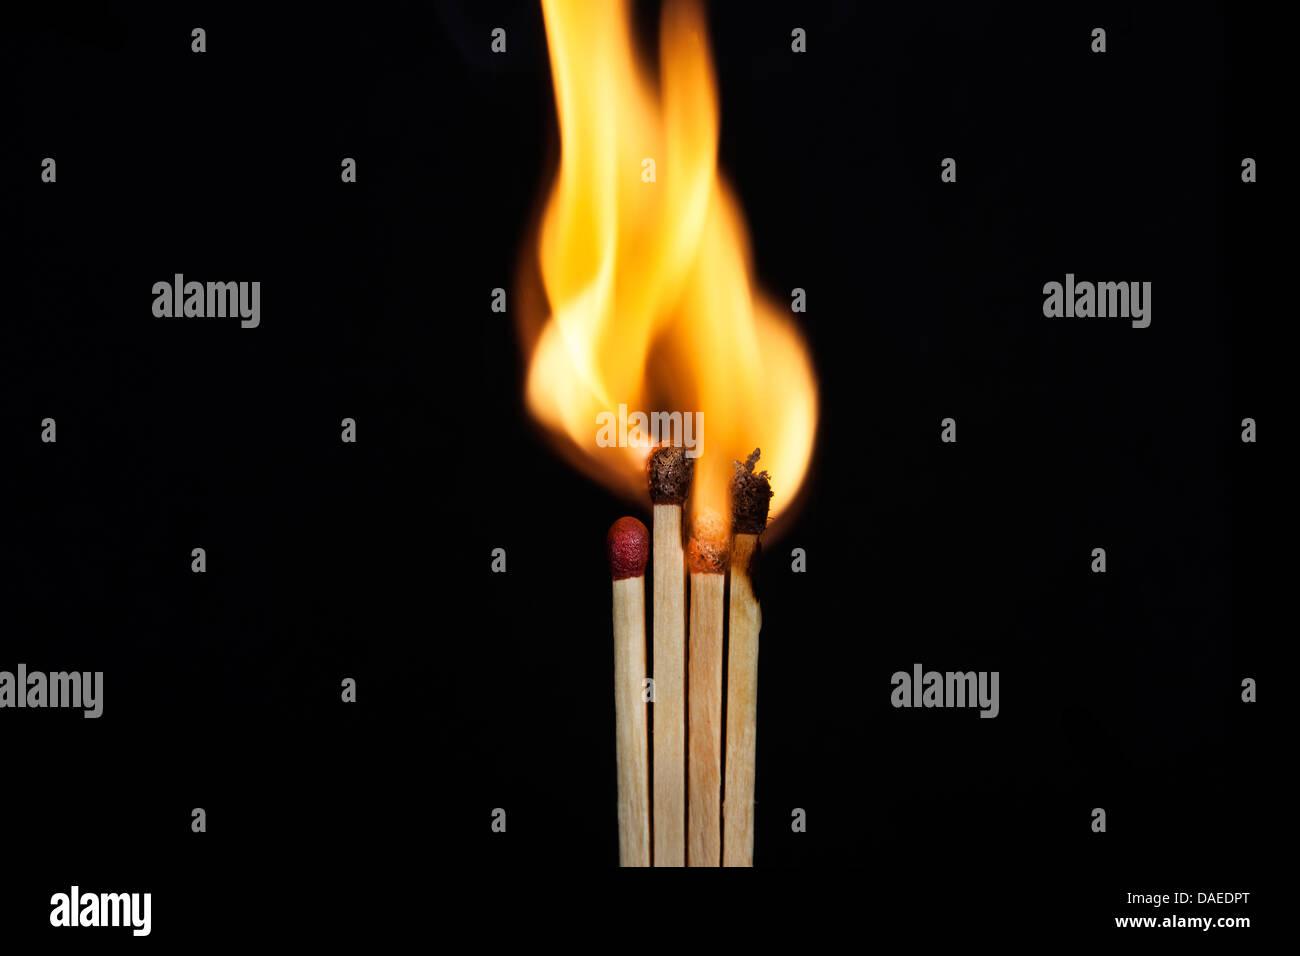 match flame matchstick black fire background blaze closeup stick light burning isolated nobody sulfur power yellow - Stock Image